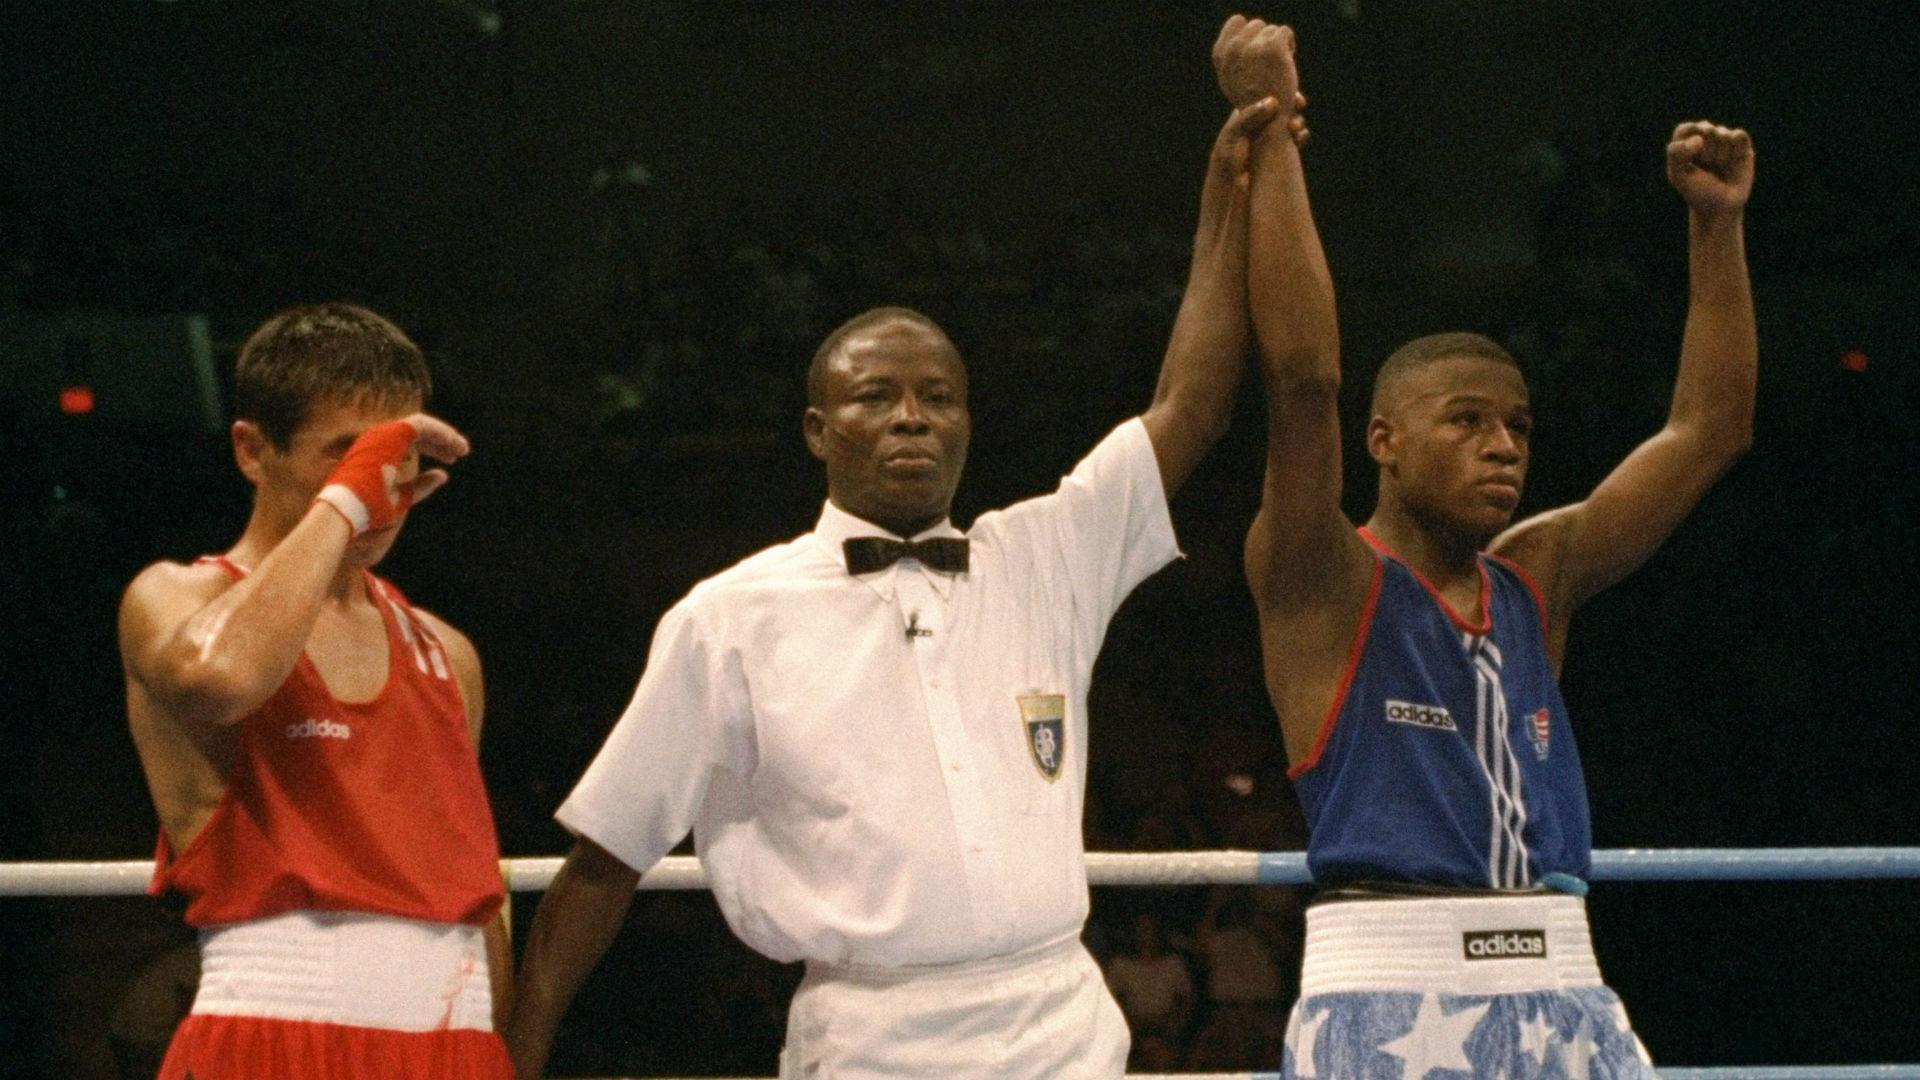 British Amateur Boxing Association welcomes Rio 2016 proposals